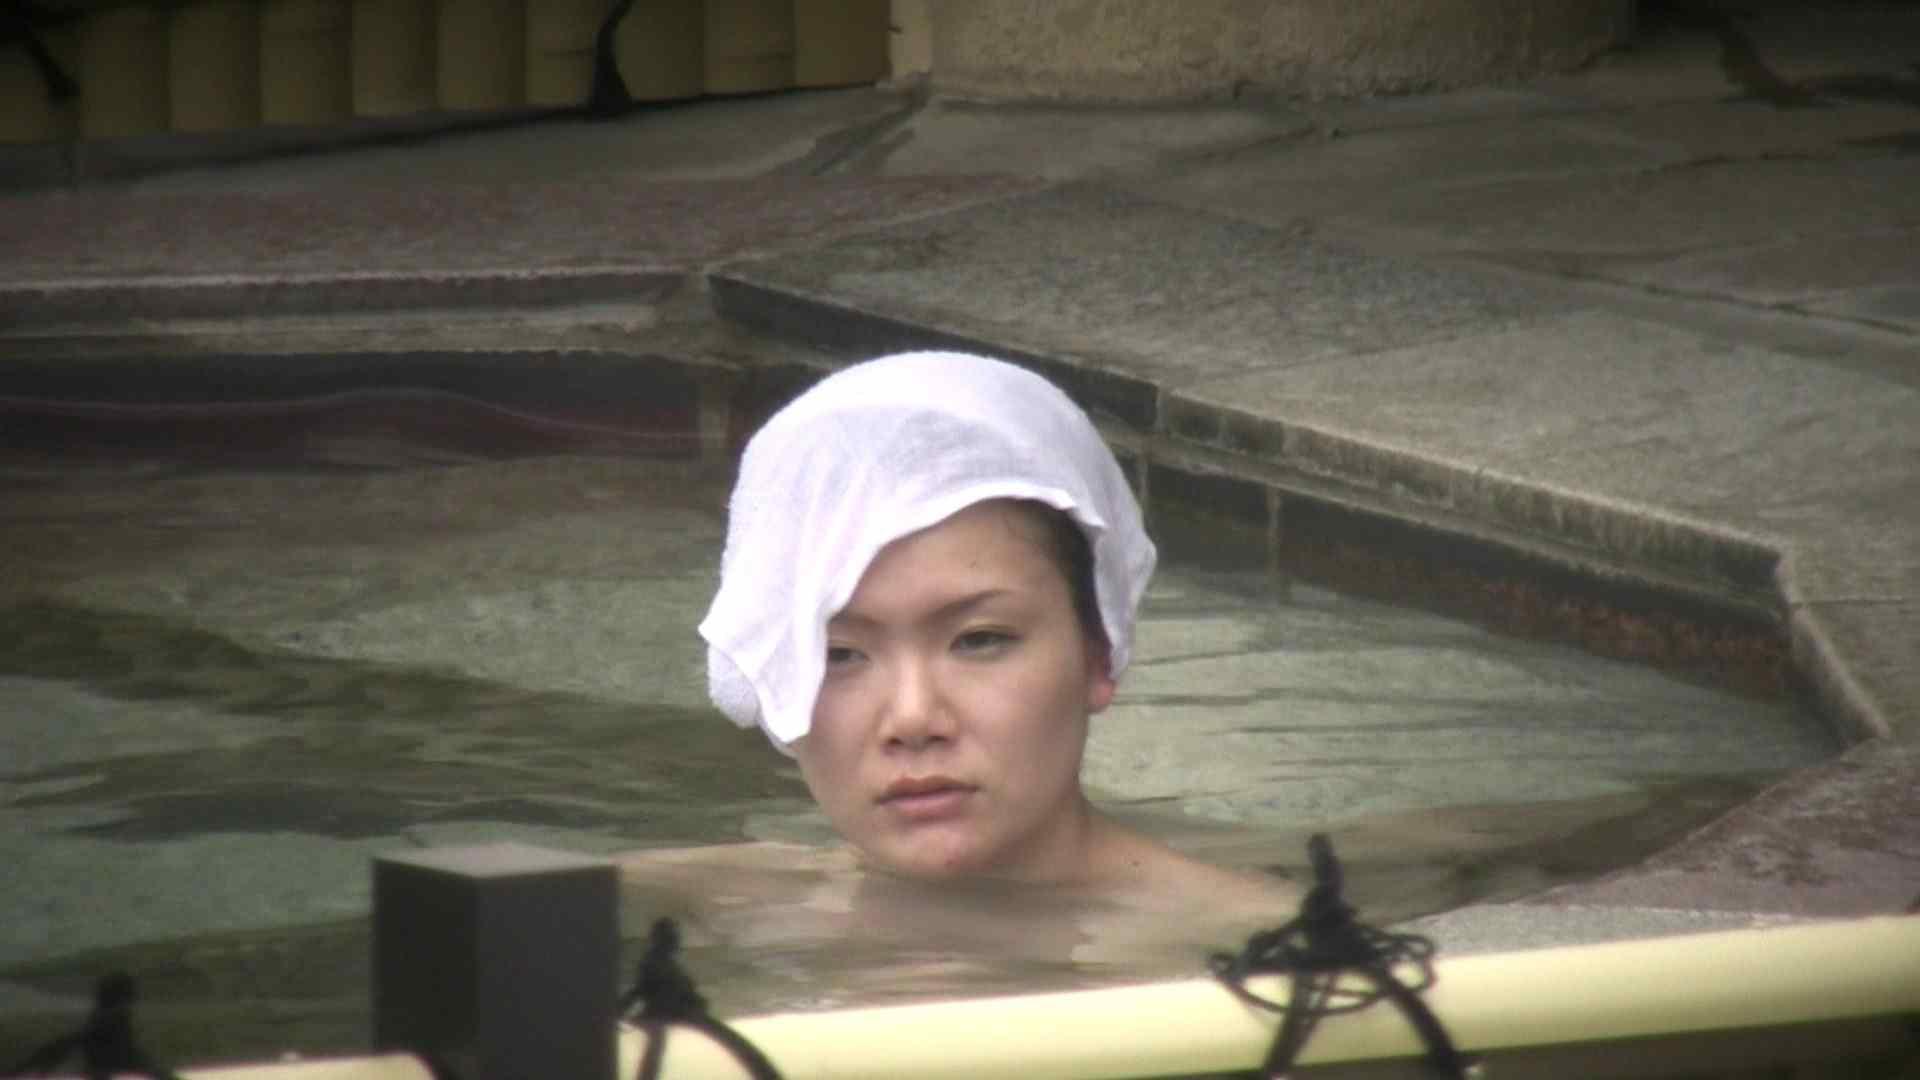 Aquaな露天風呂Vol.12【VIP】 HなOL | 盗撮  83pic 82